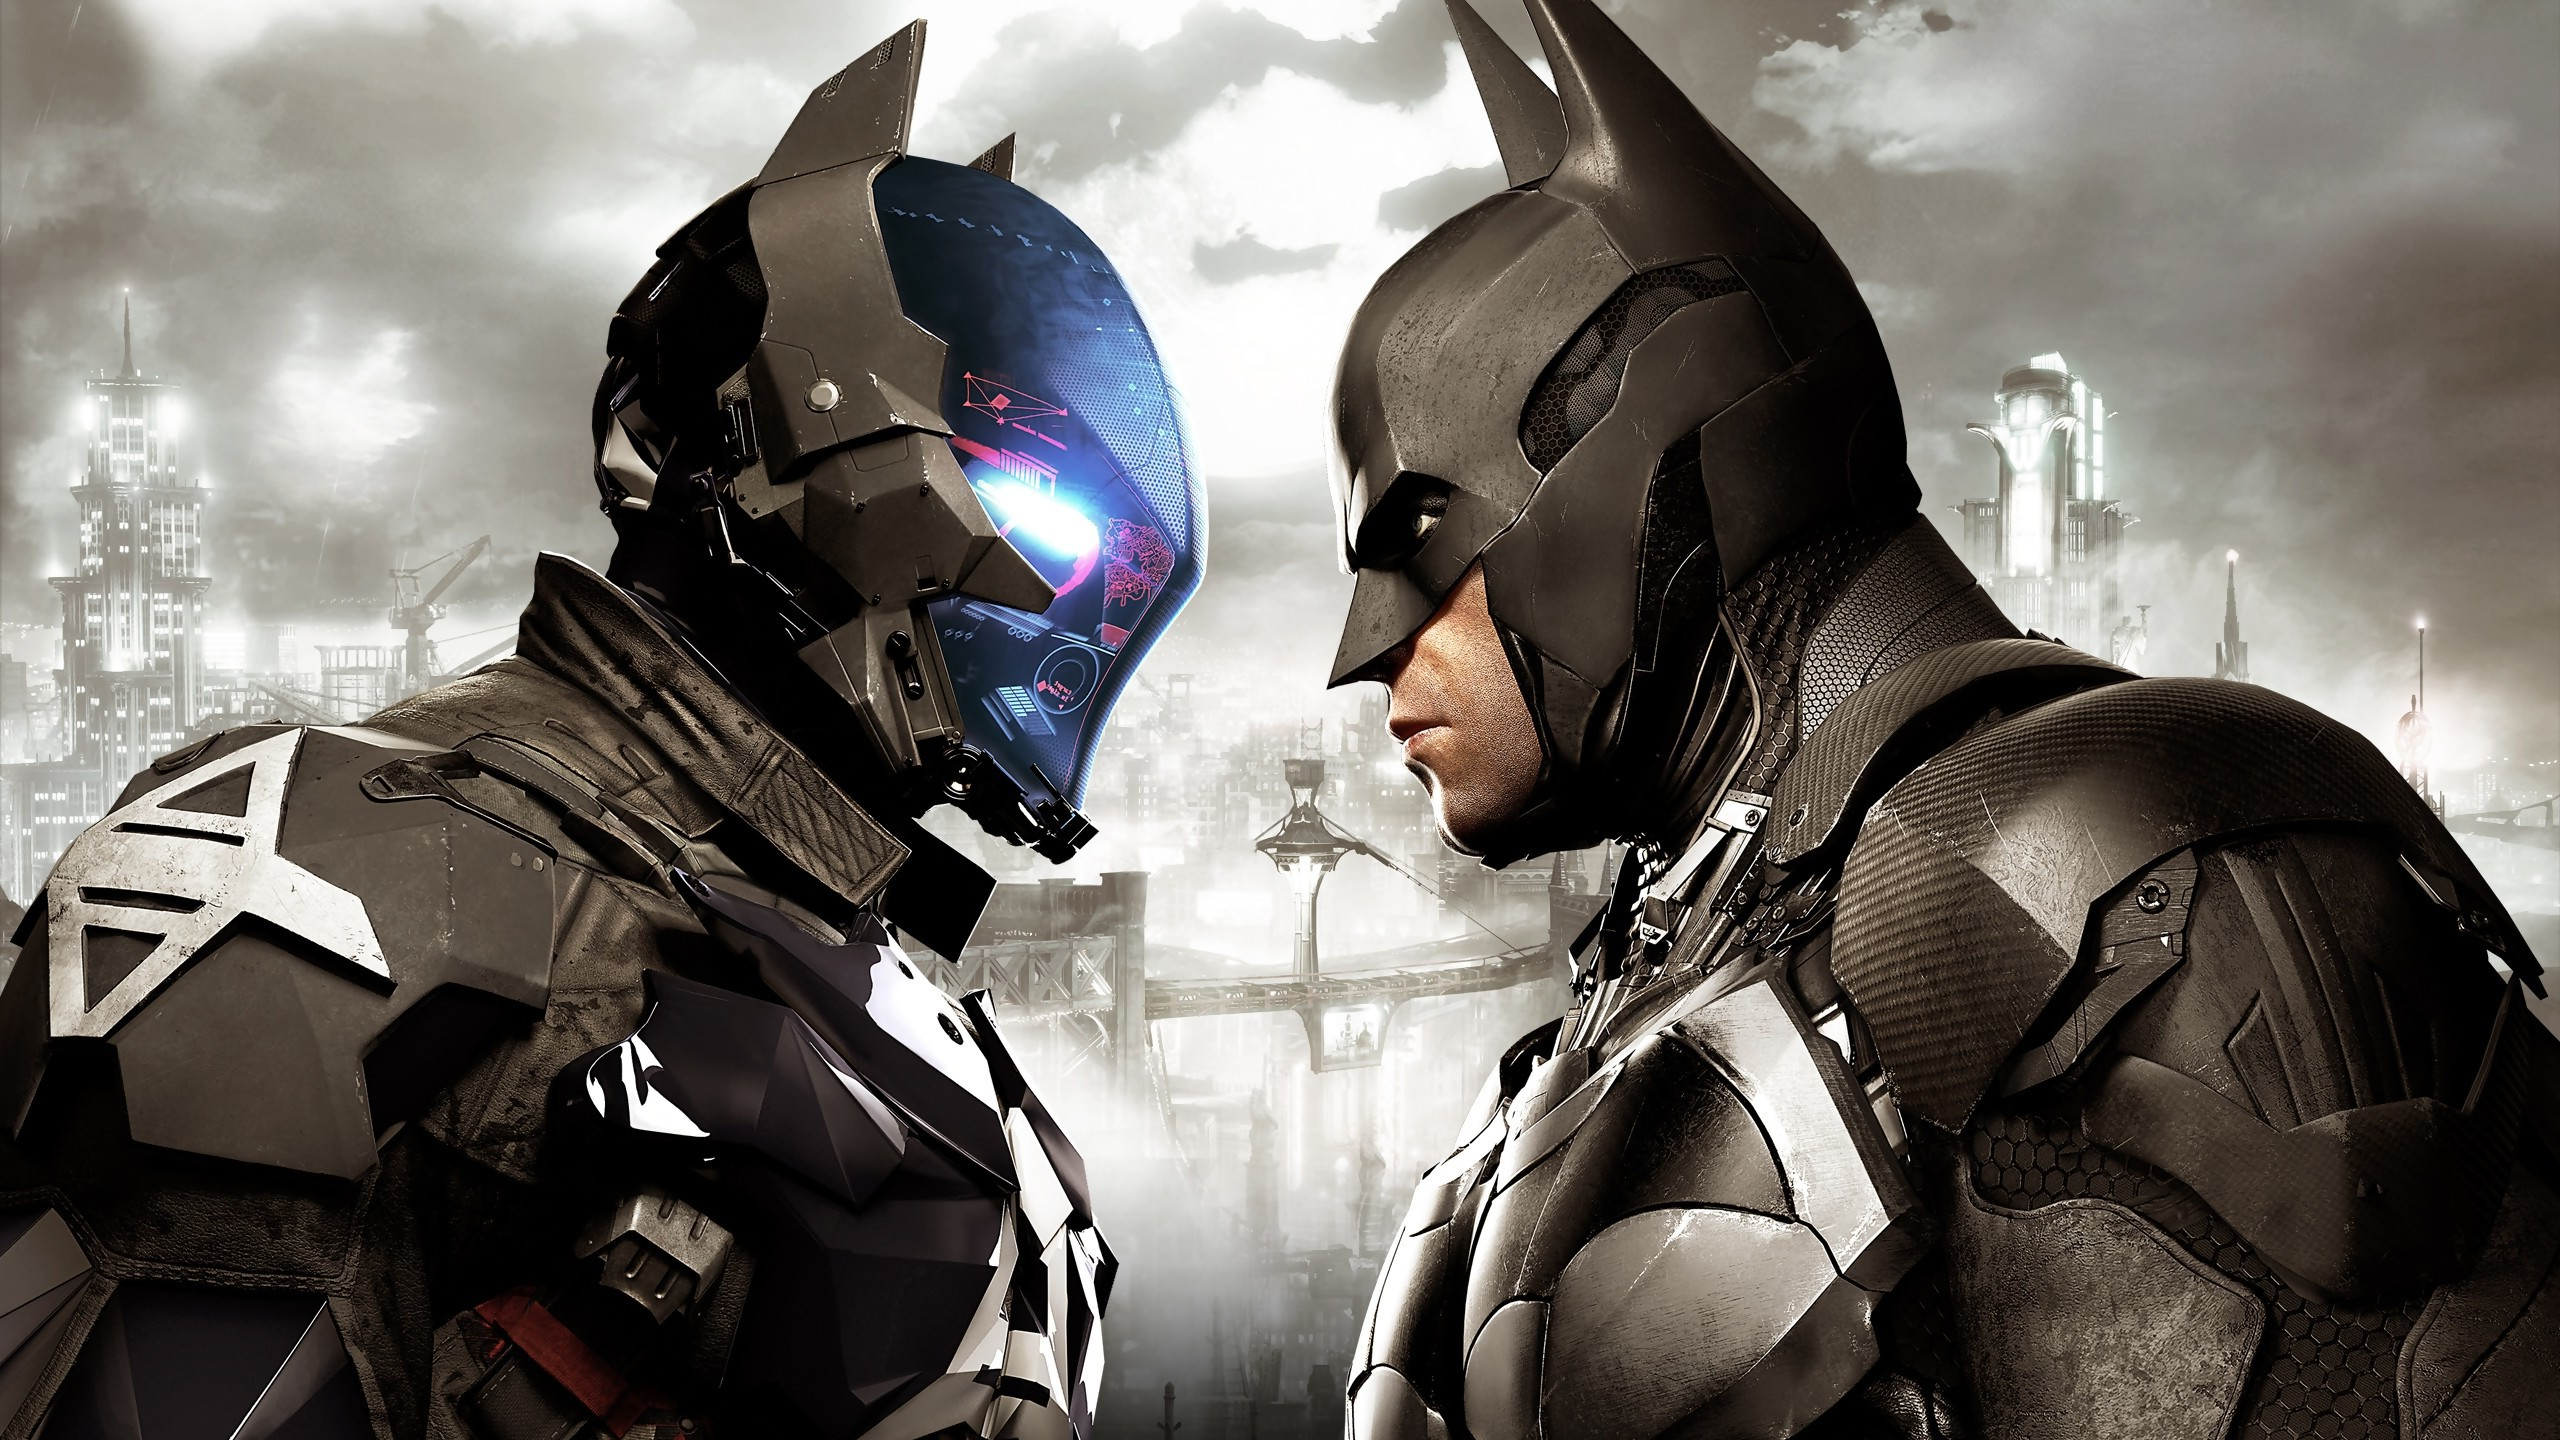 Batman Arkham Knight 2015, HD Games, 4k Wallpapers, Images